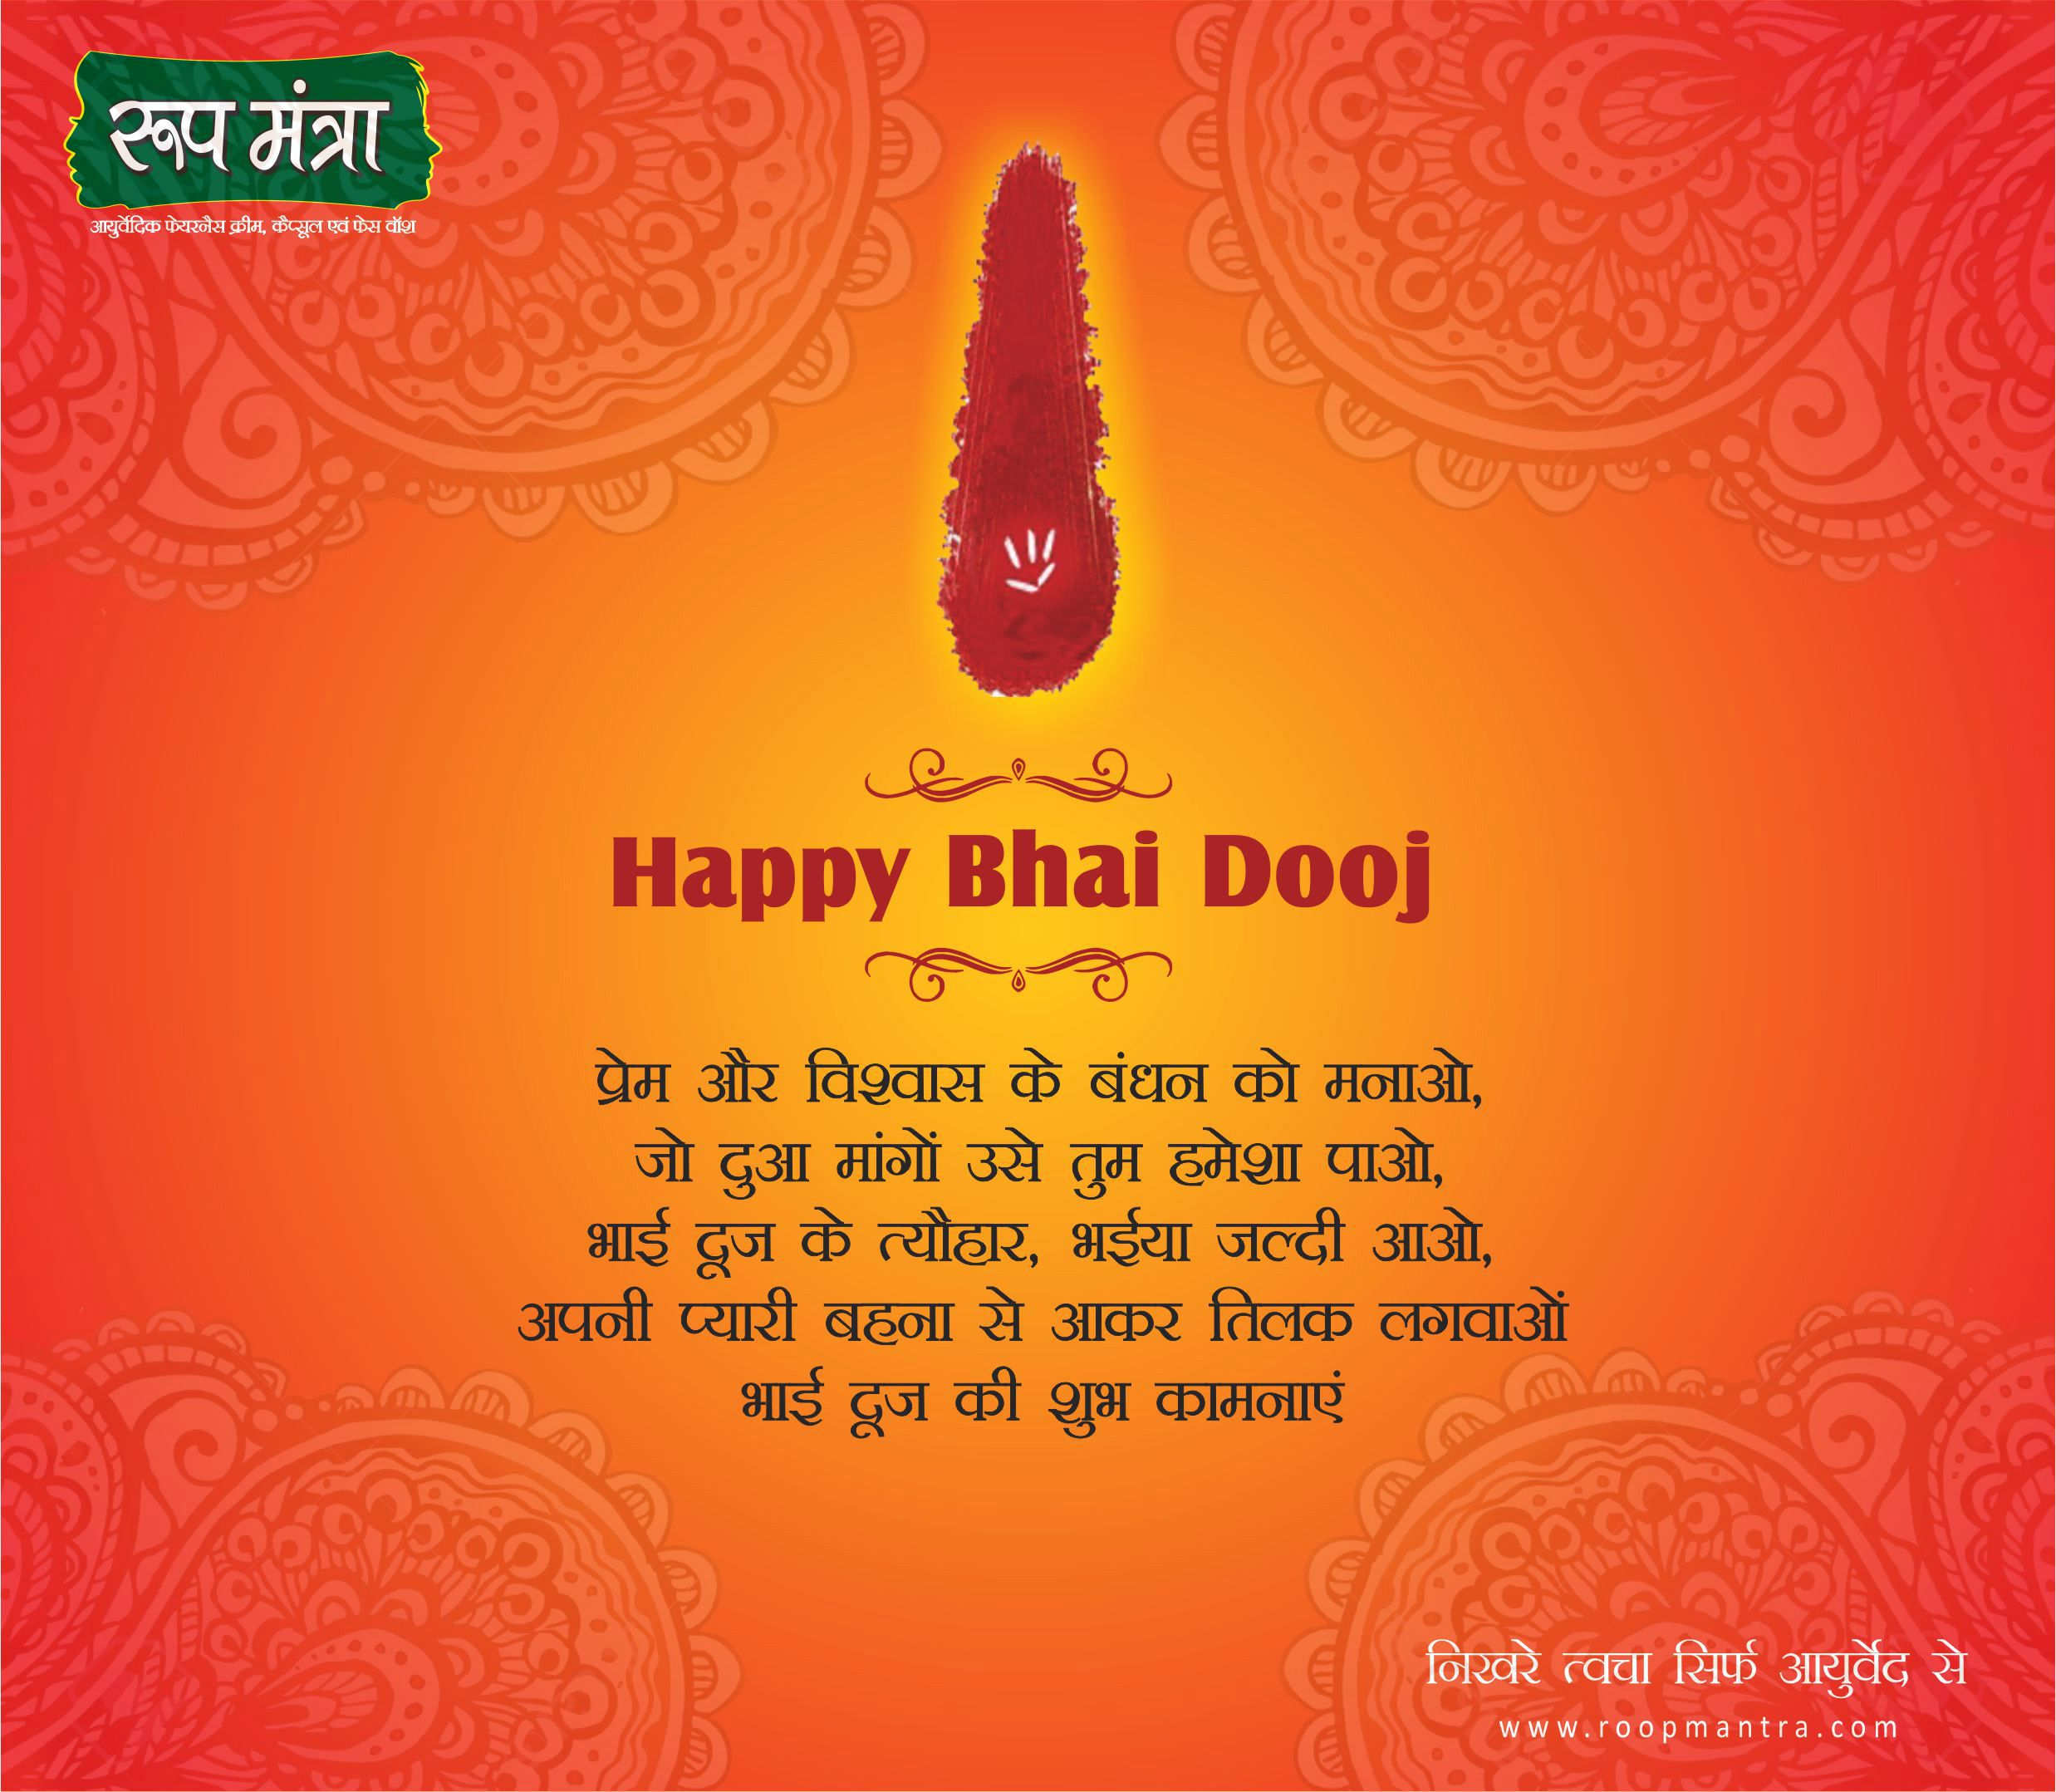 Roop Mantra  Wishes you a Very Happy Bhai Dooj. -#RoopMantra www.roopmantra.com | 24X7 Helpline: 0171-3055111